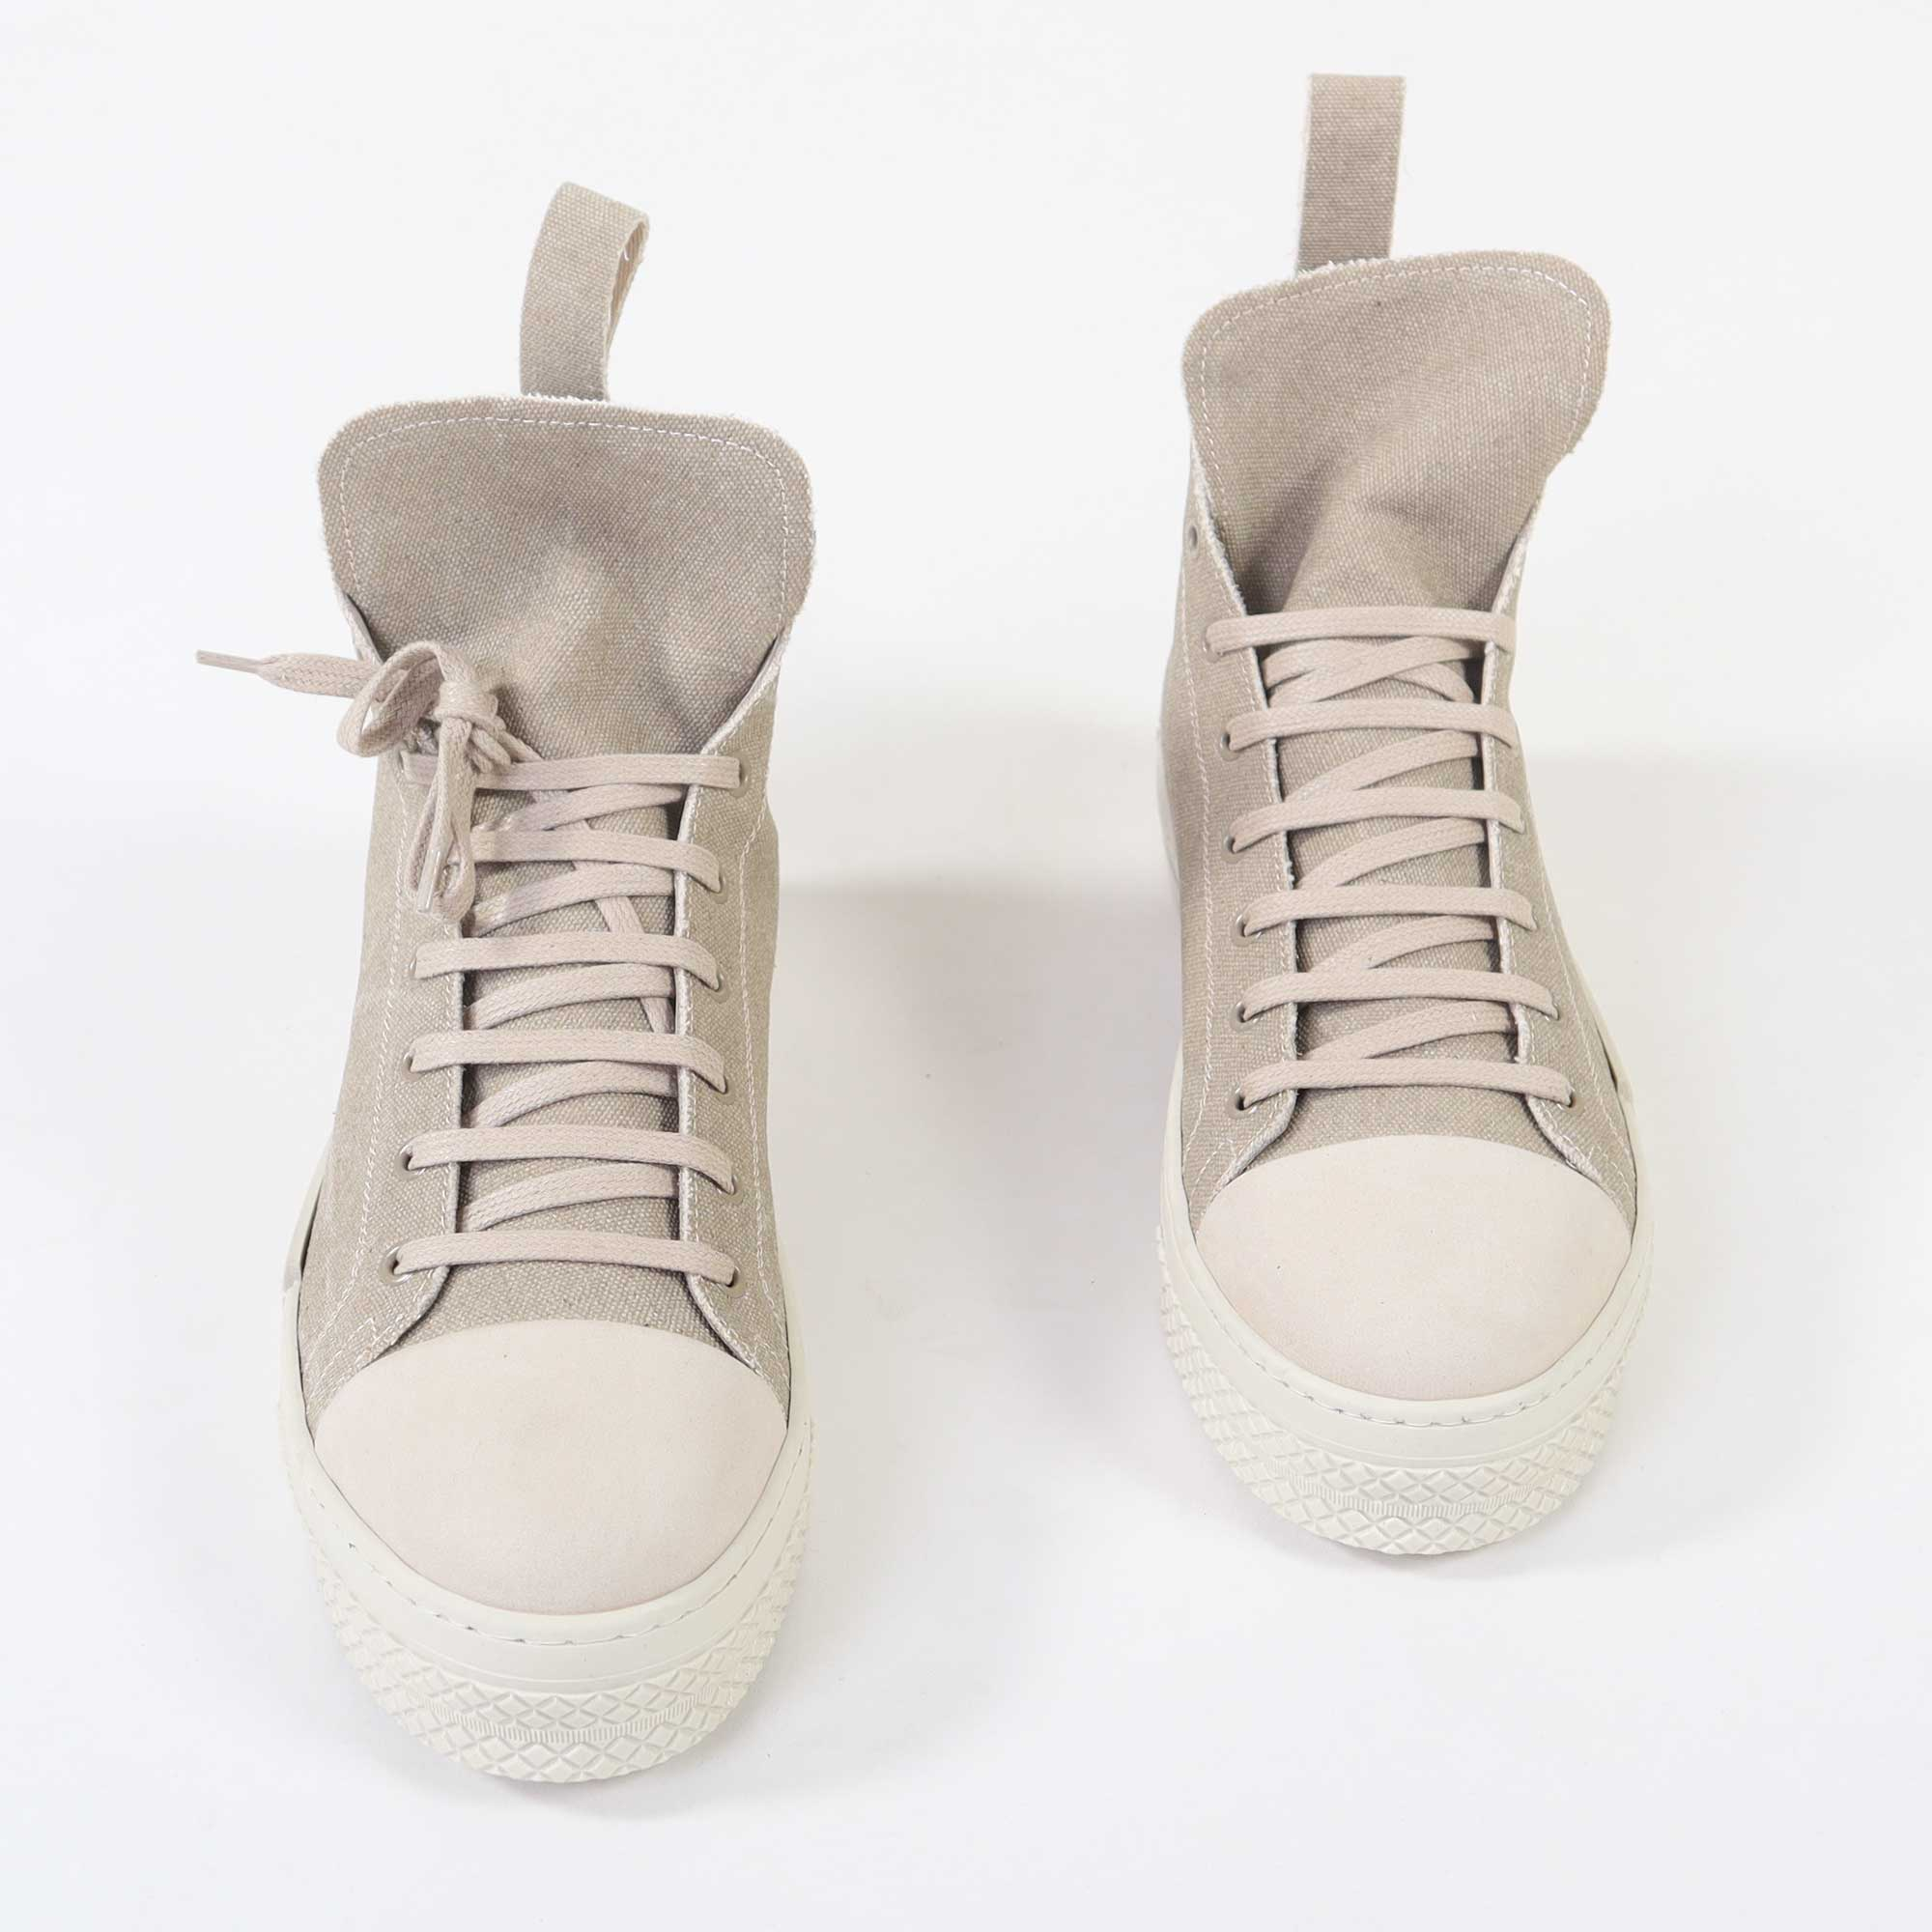 sneakers-beige-3